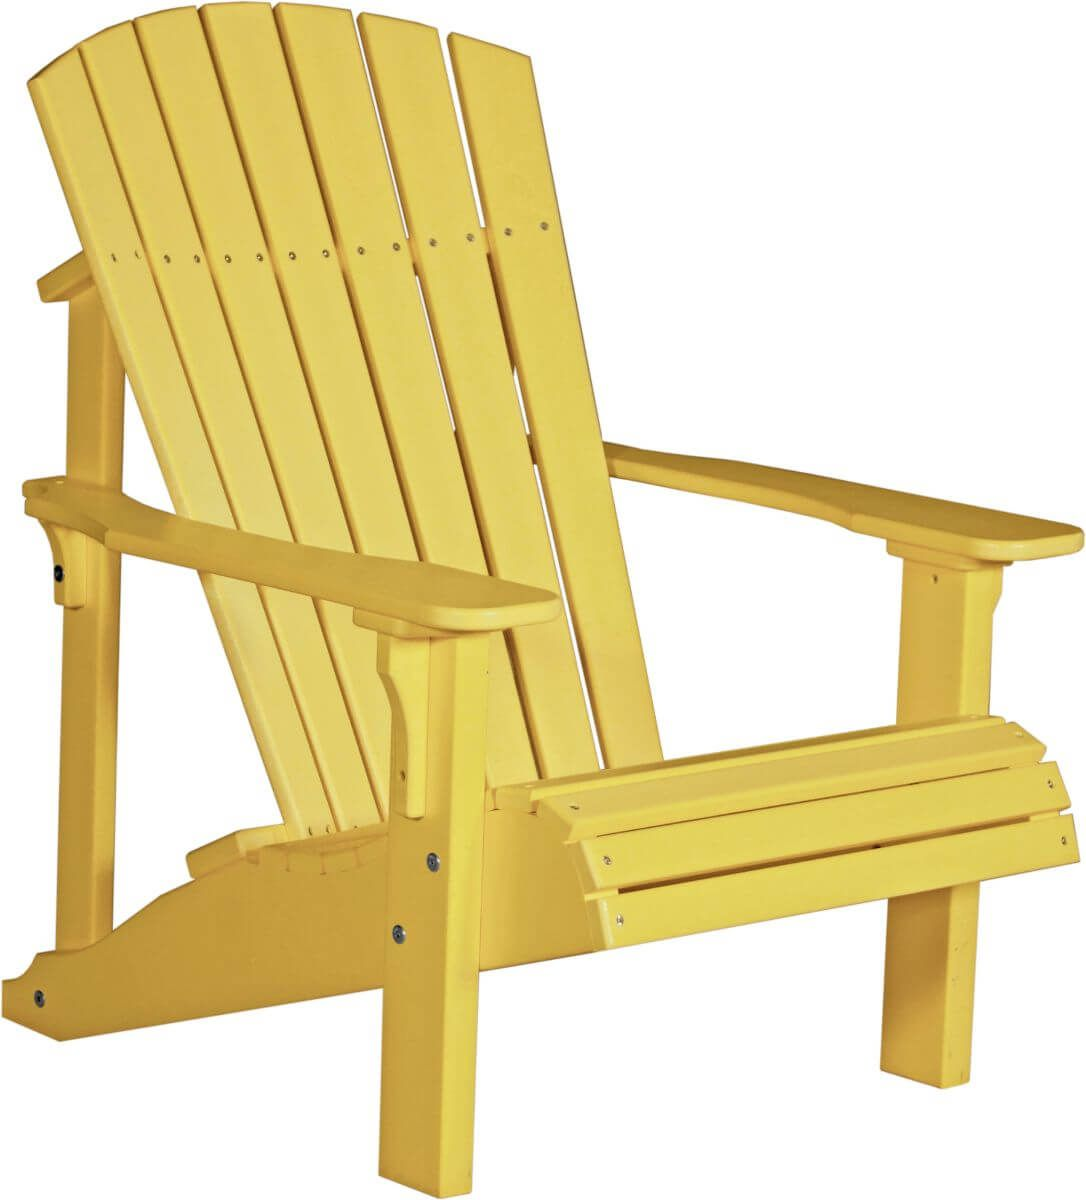 Yellow Rockaway Adirondack Chair